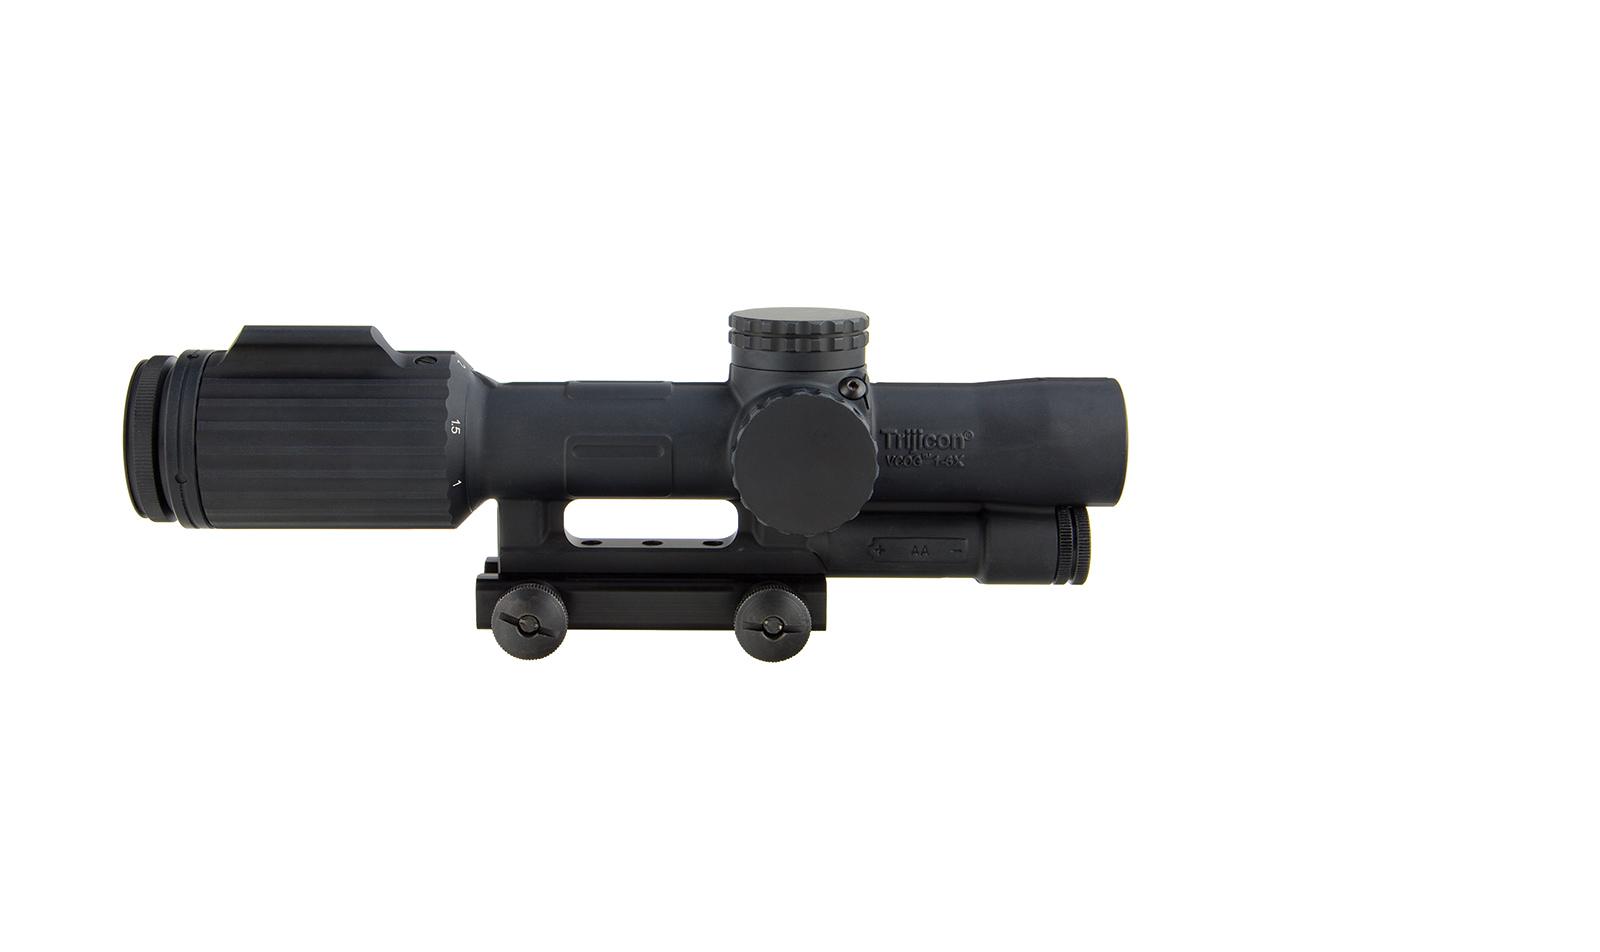 VC16-C-1600040 angle 6